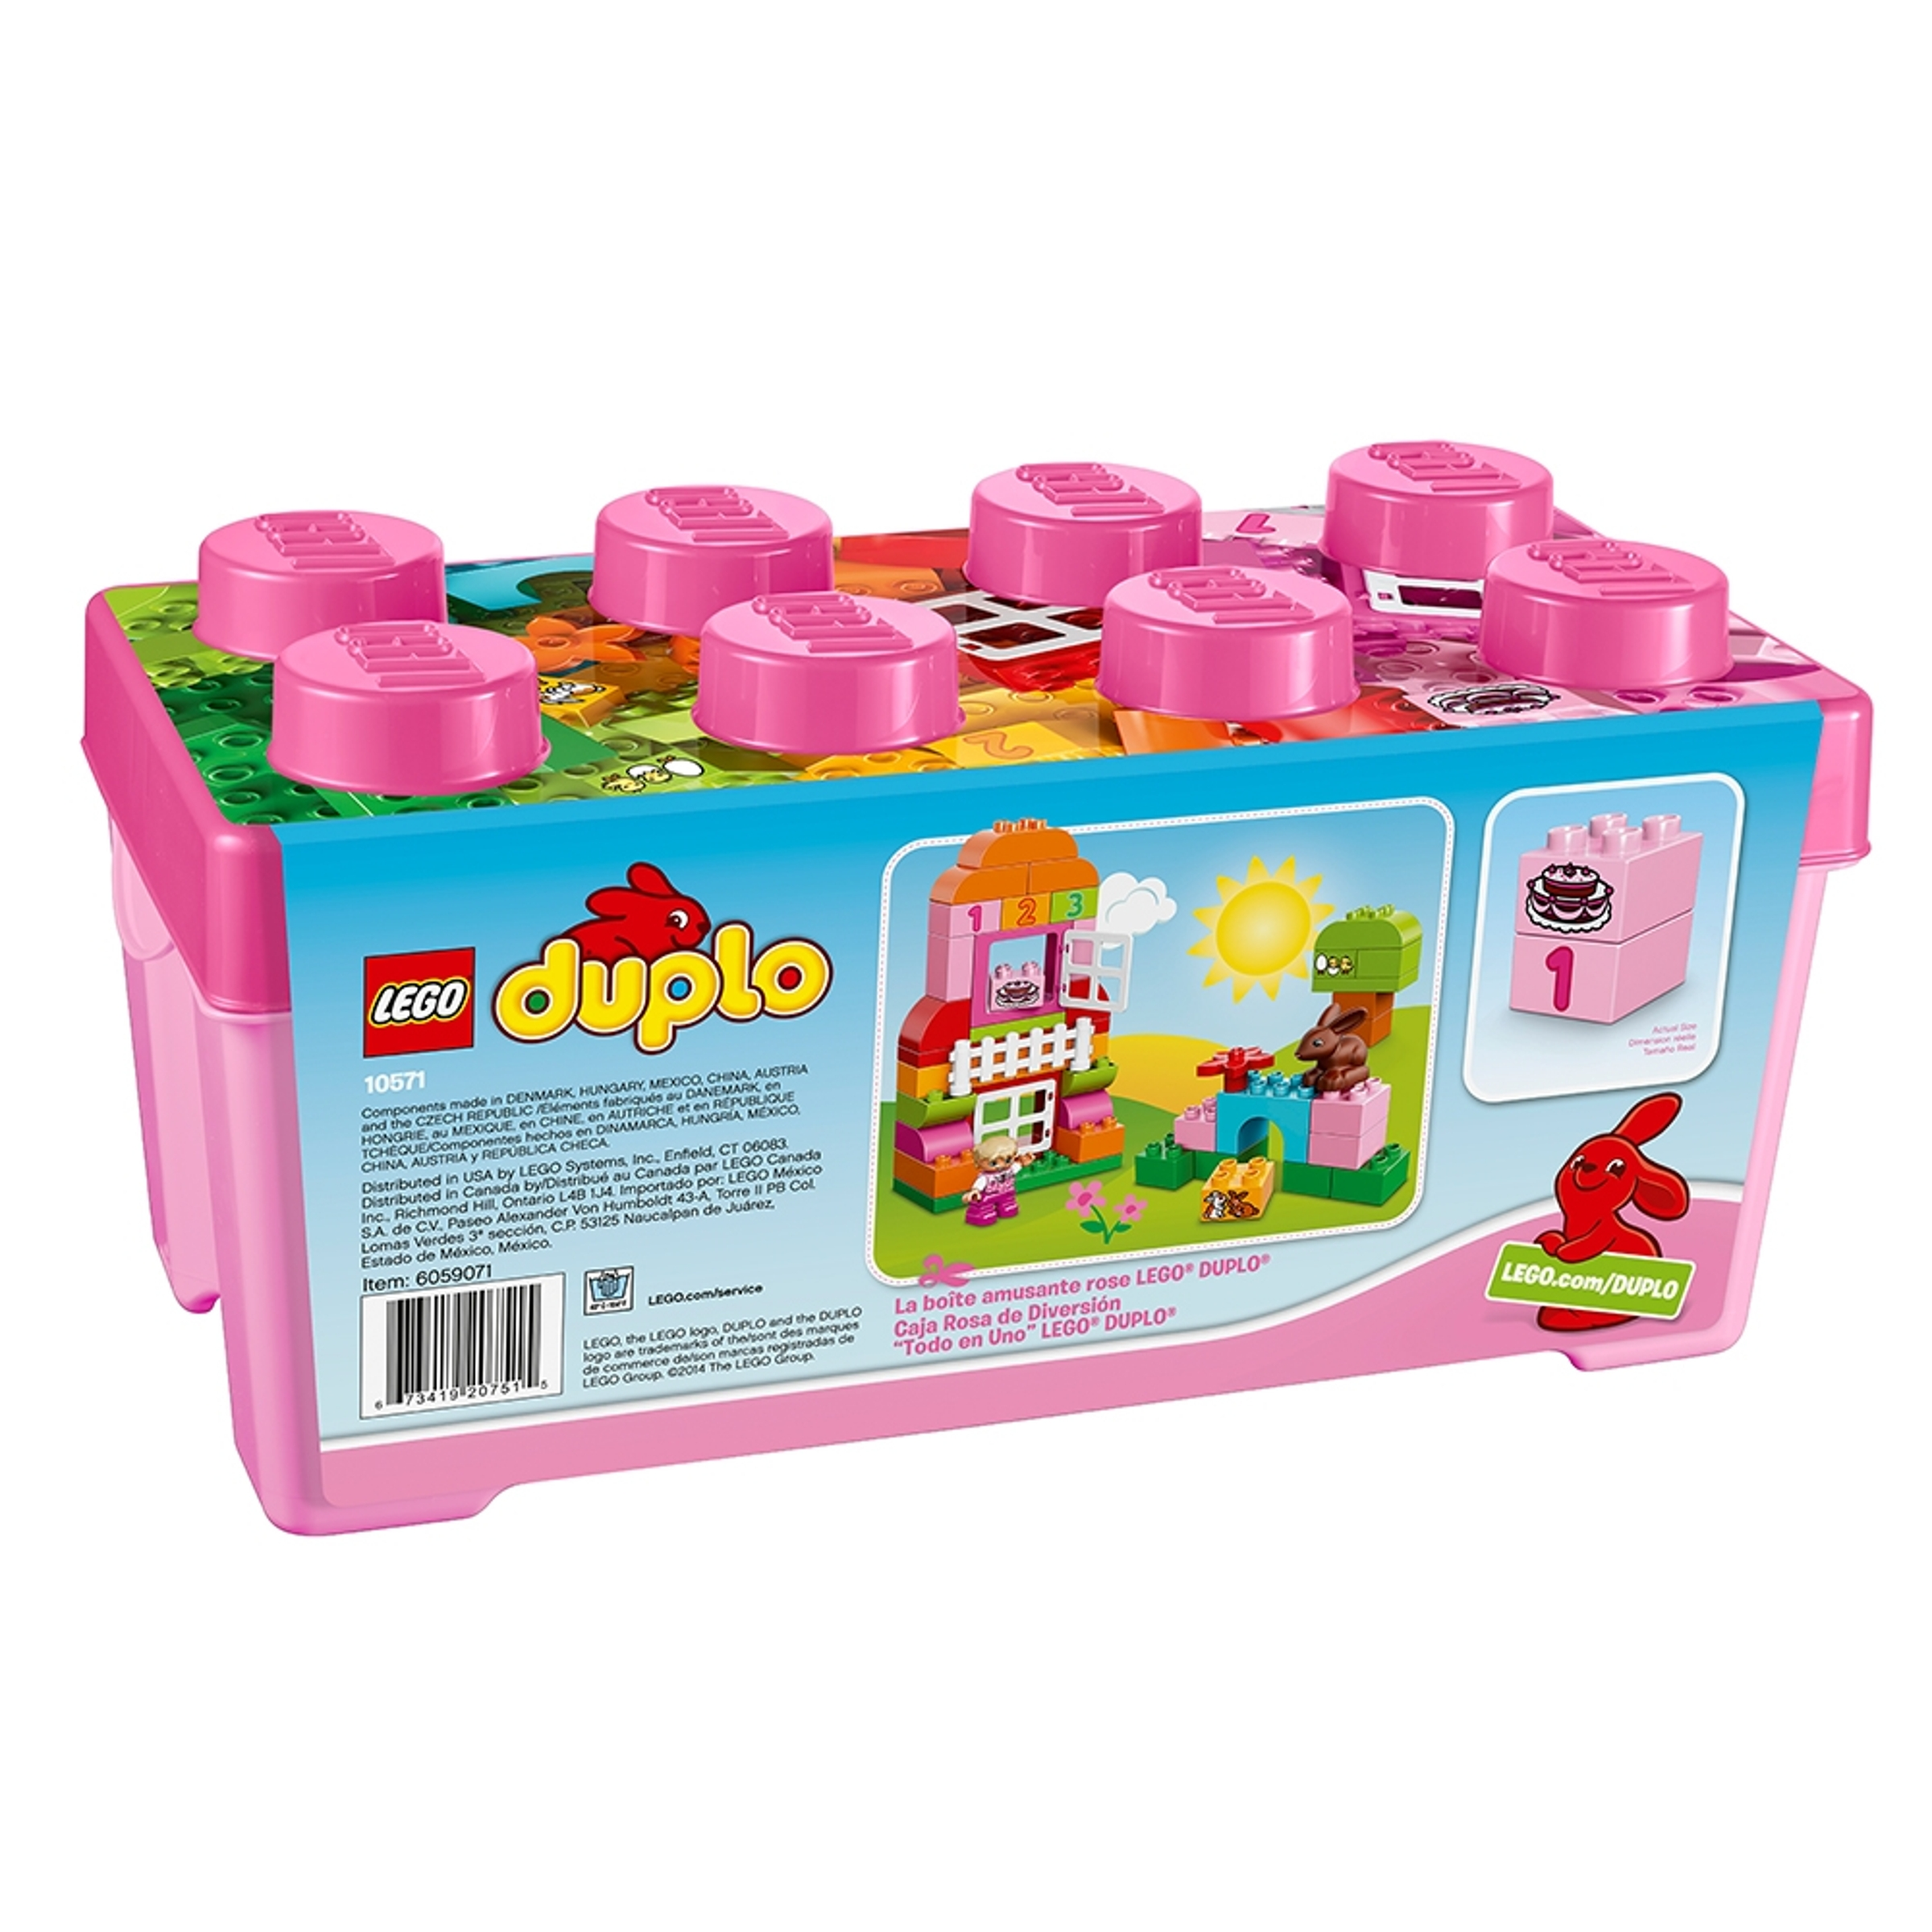 duplo 10571 all in one pinkki leikkilaatikko